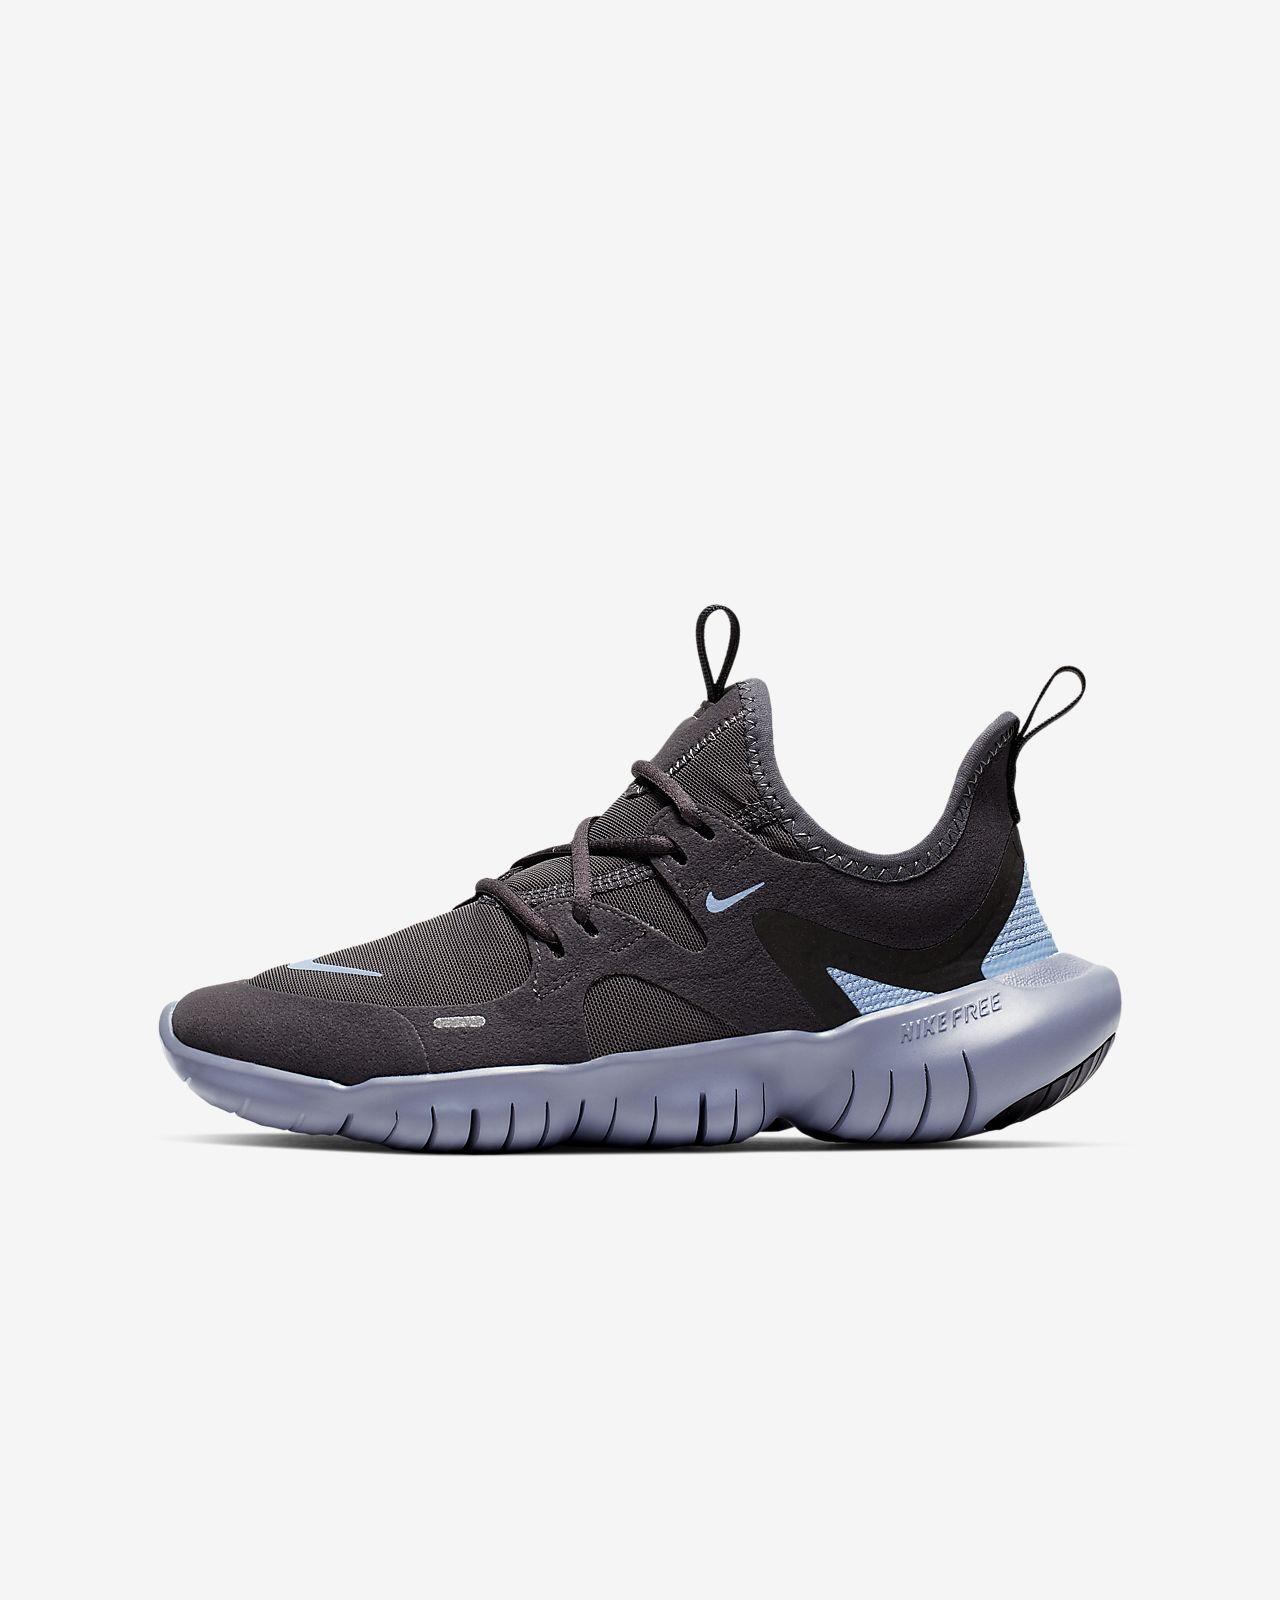 Nike Free RN 5,0 Zapatillas de running - Niño/a